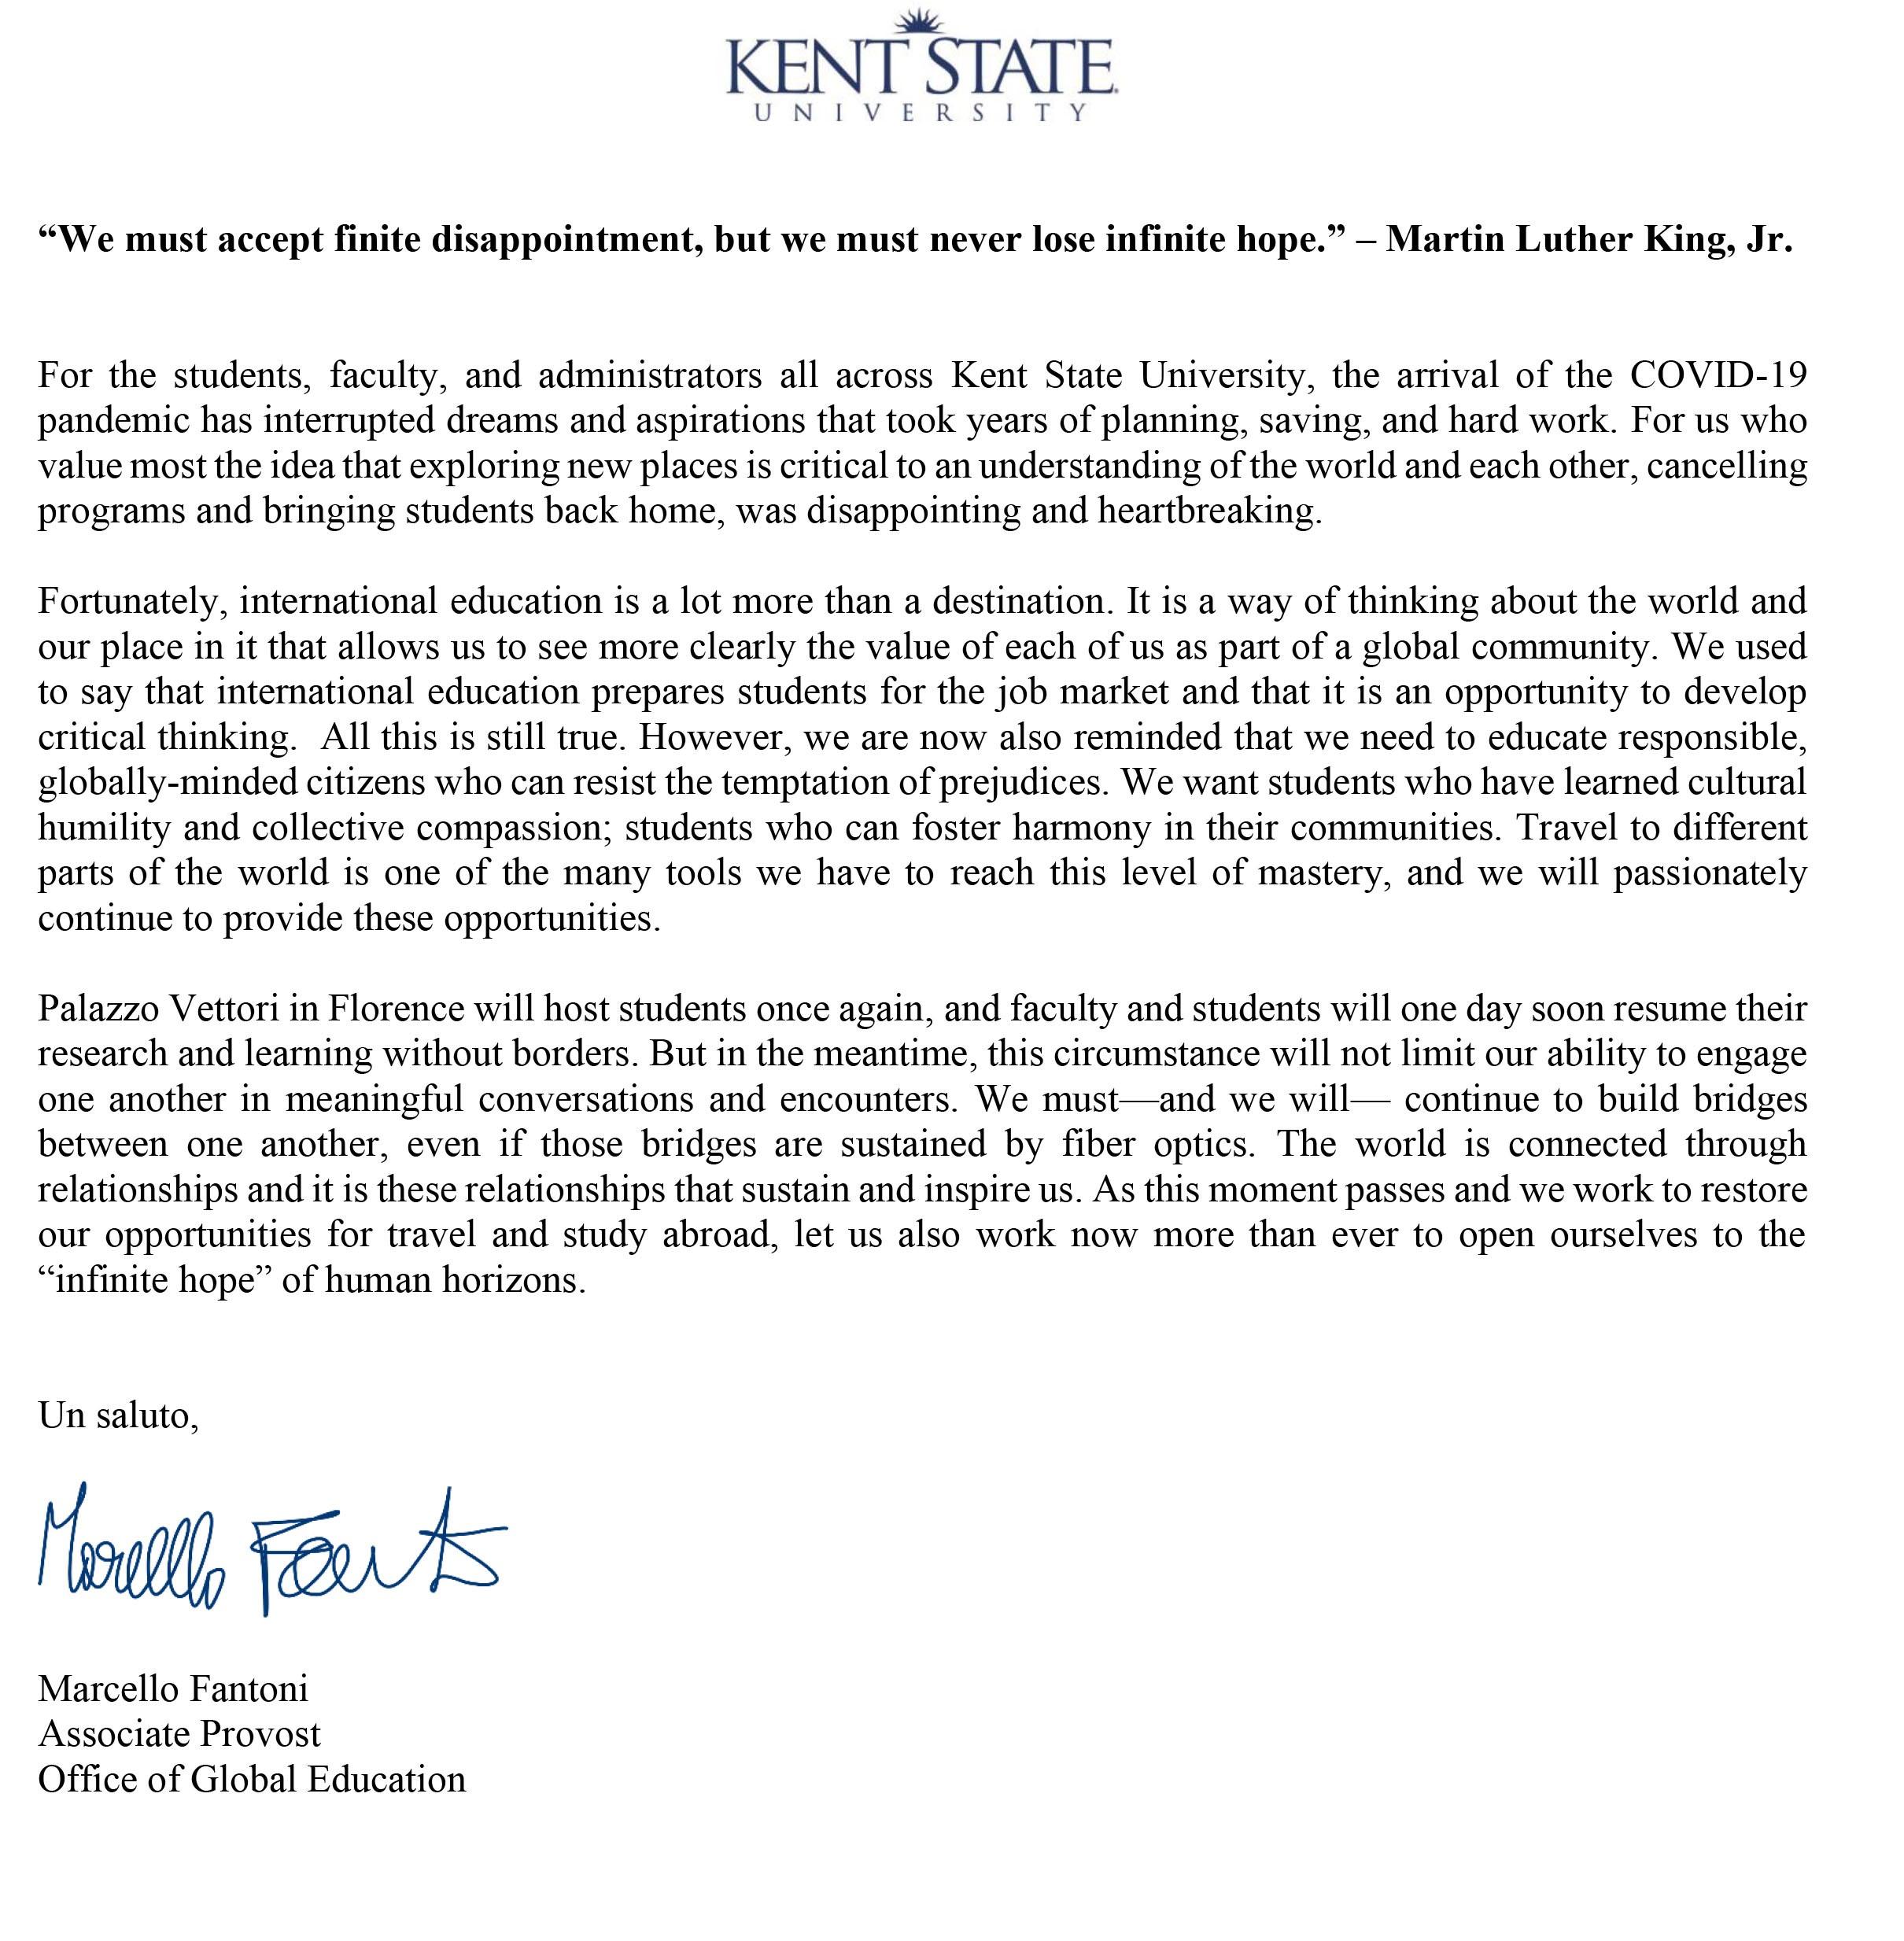 Letter from Associate Provost Marcello Fantoni